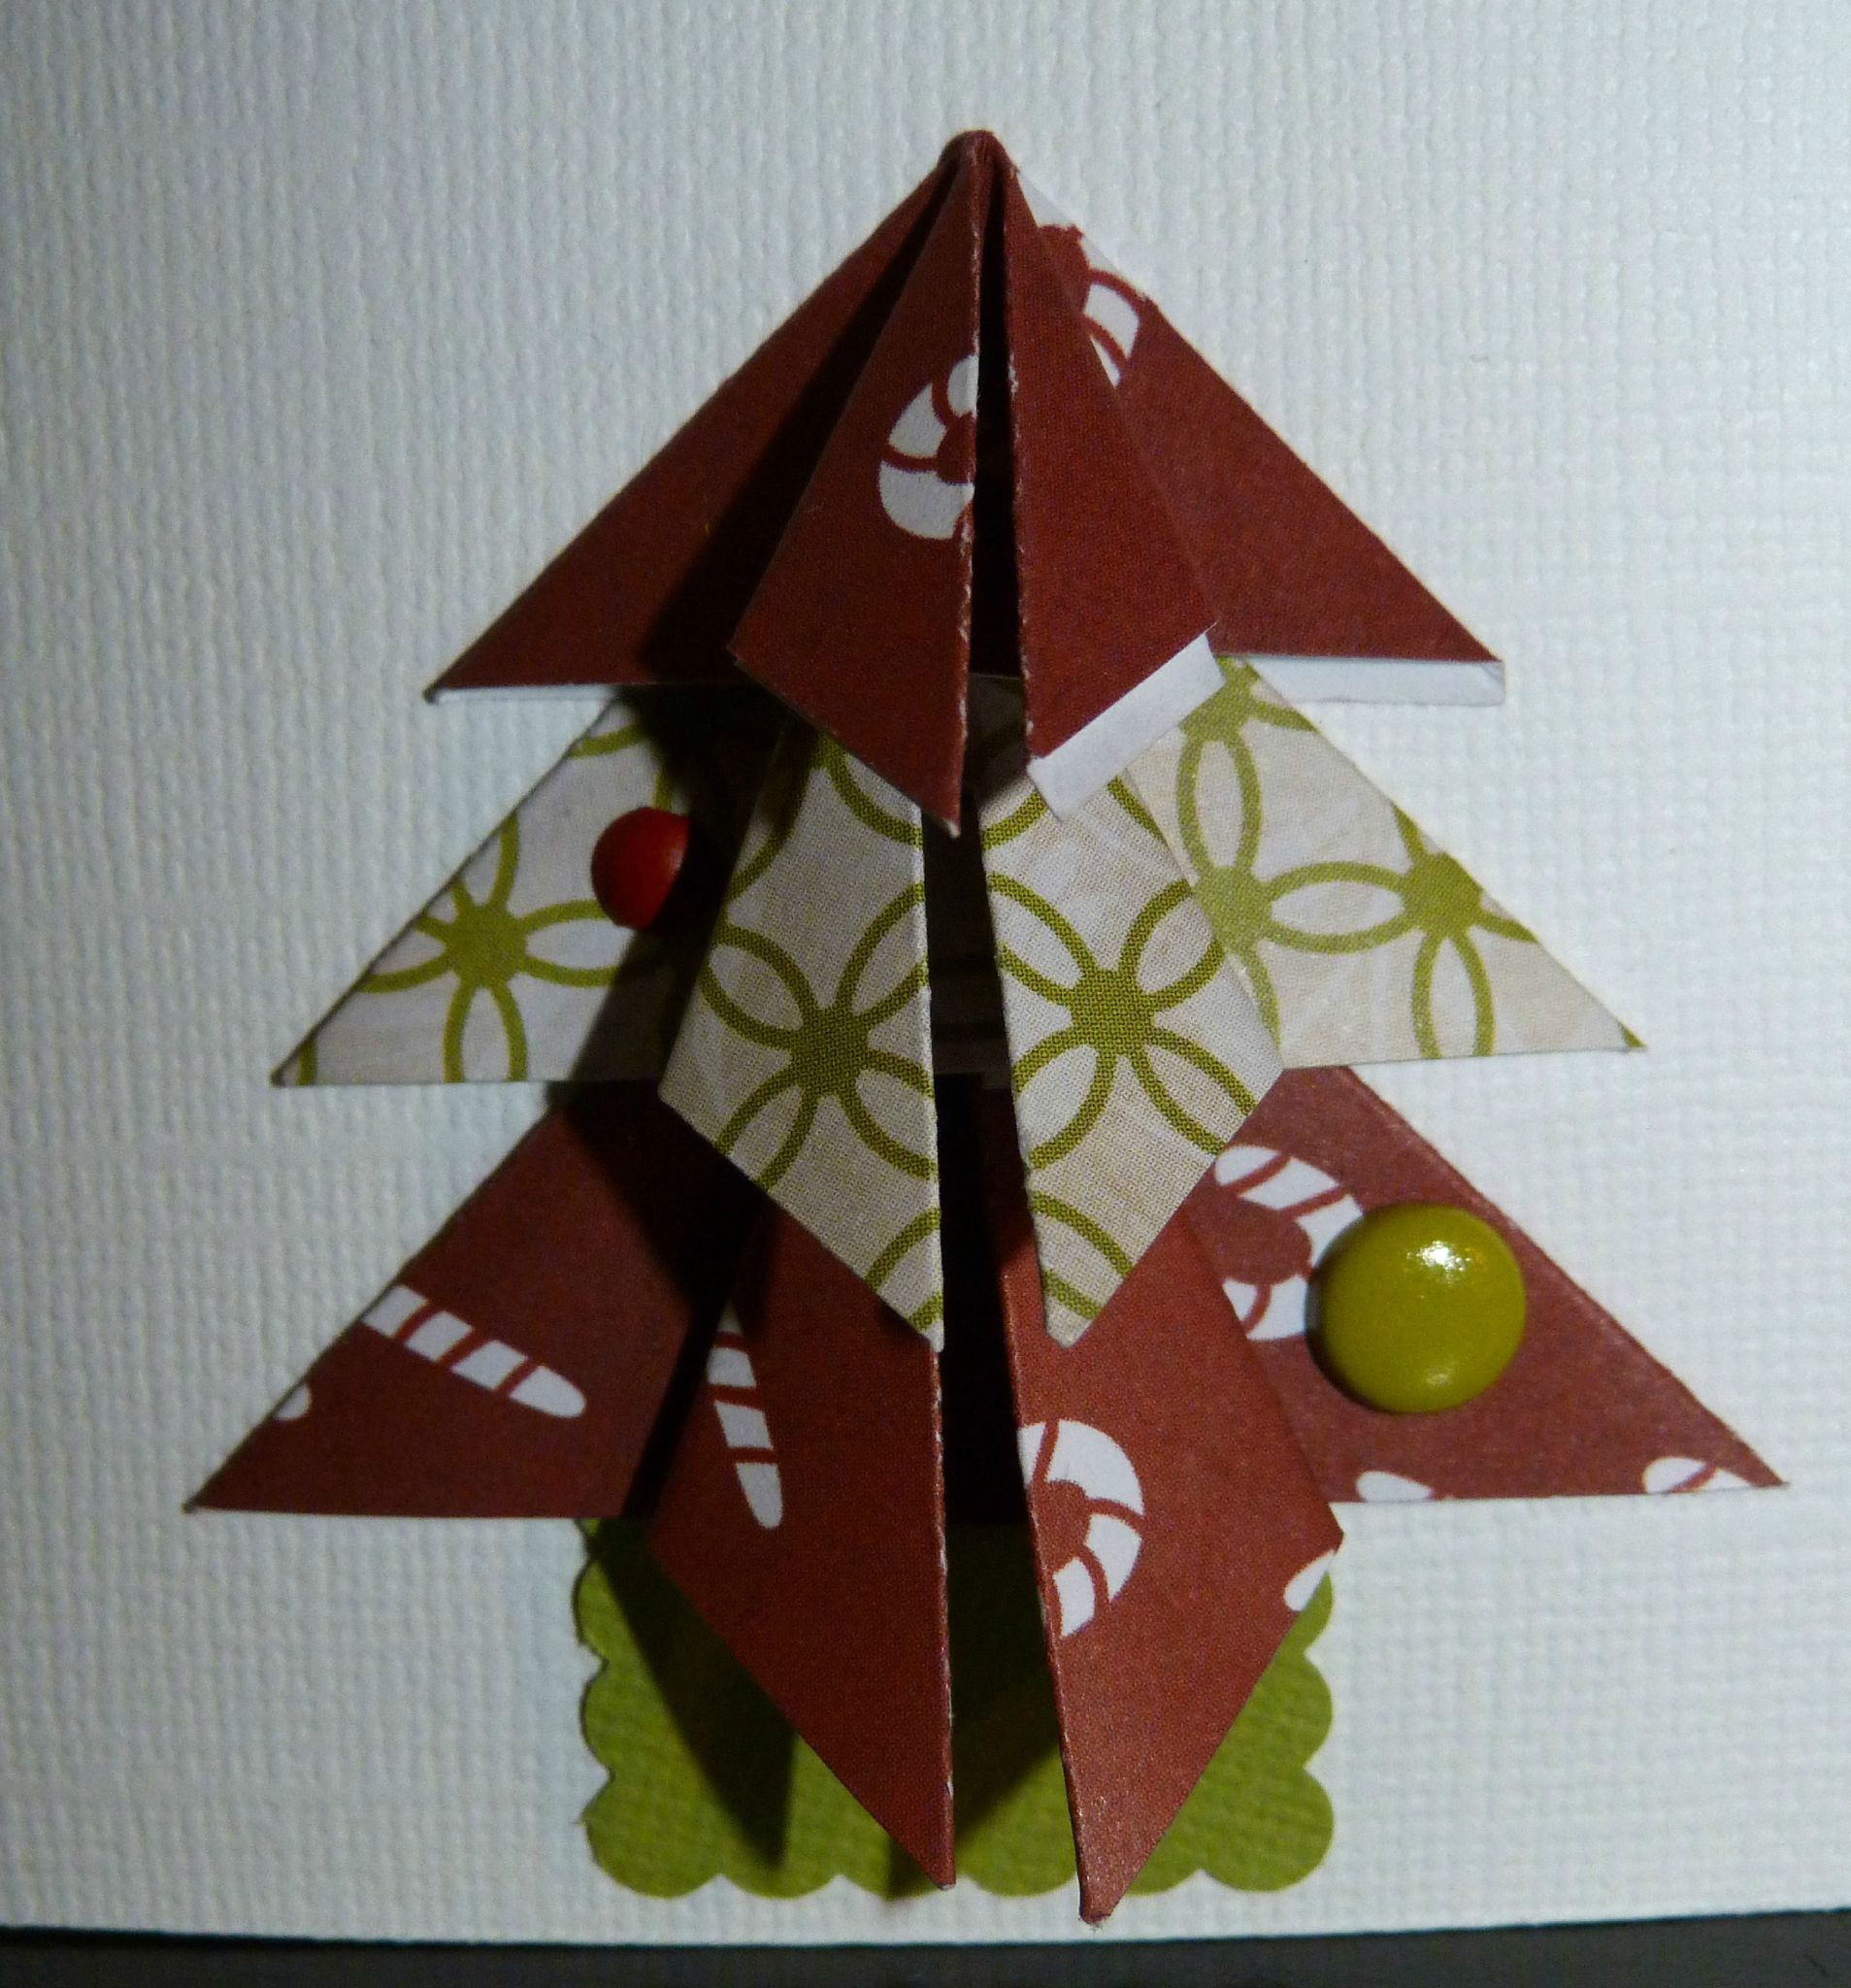 origami de noel facile origami p re no l super facile. Black Bedroom Furniture Sets. Home Design Ideas